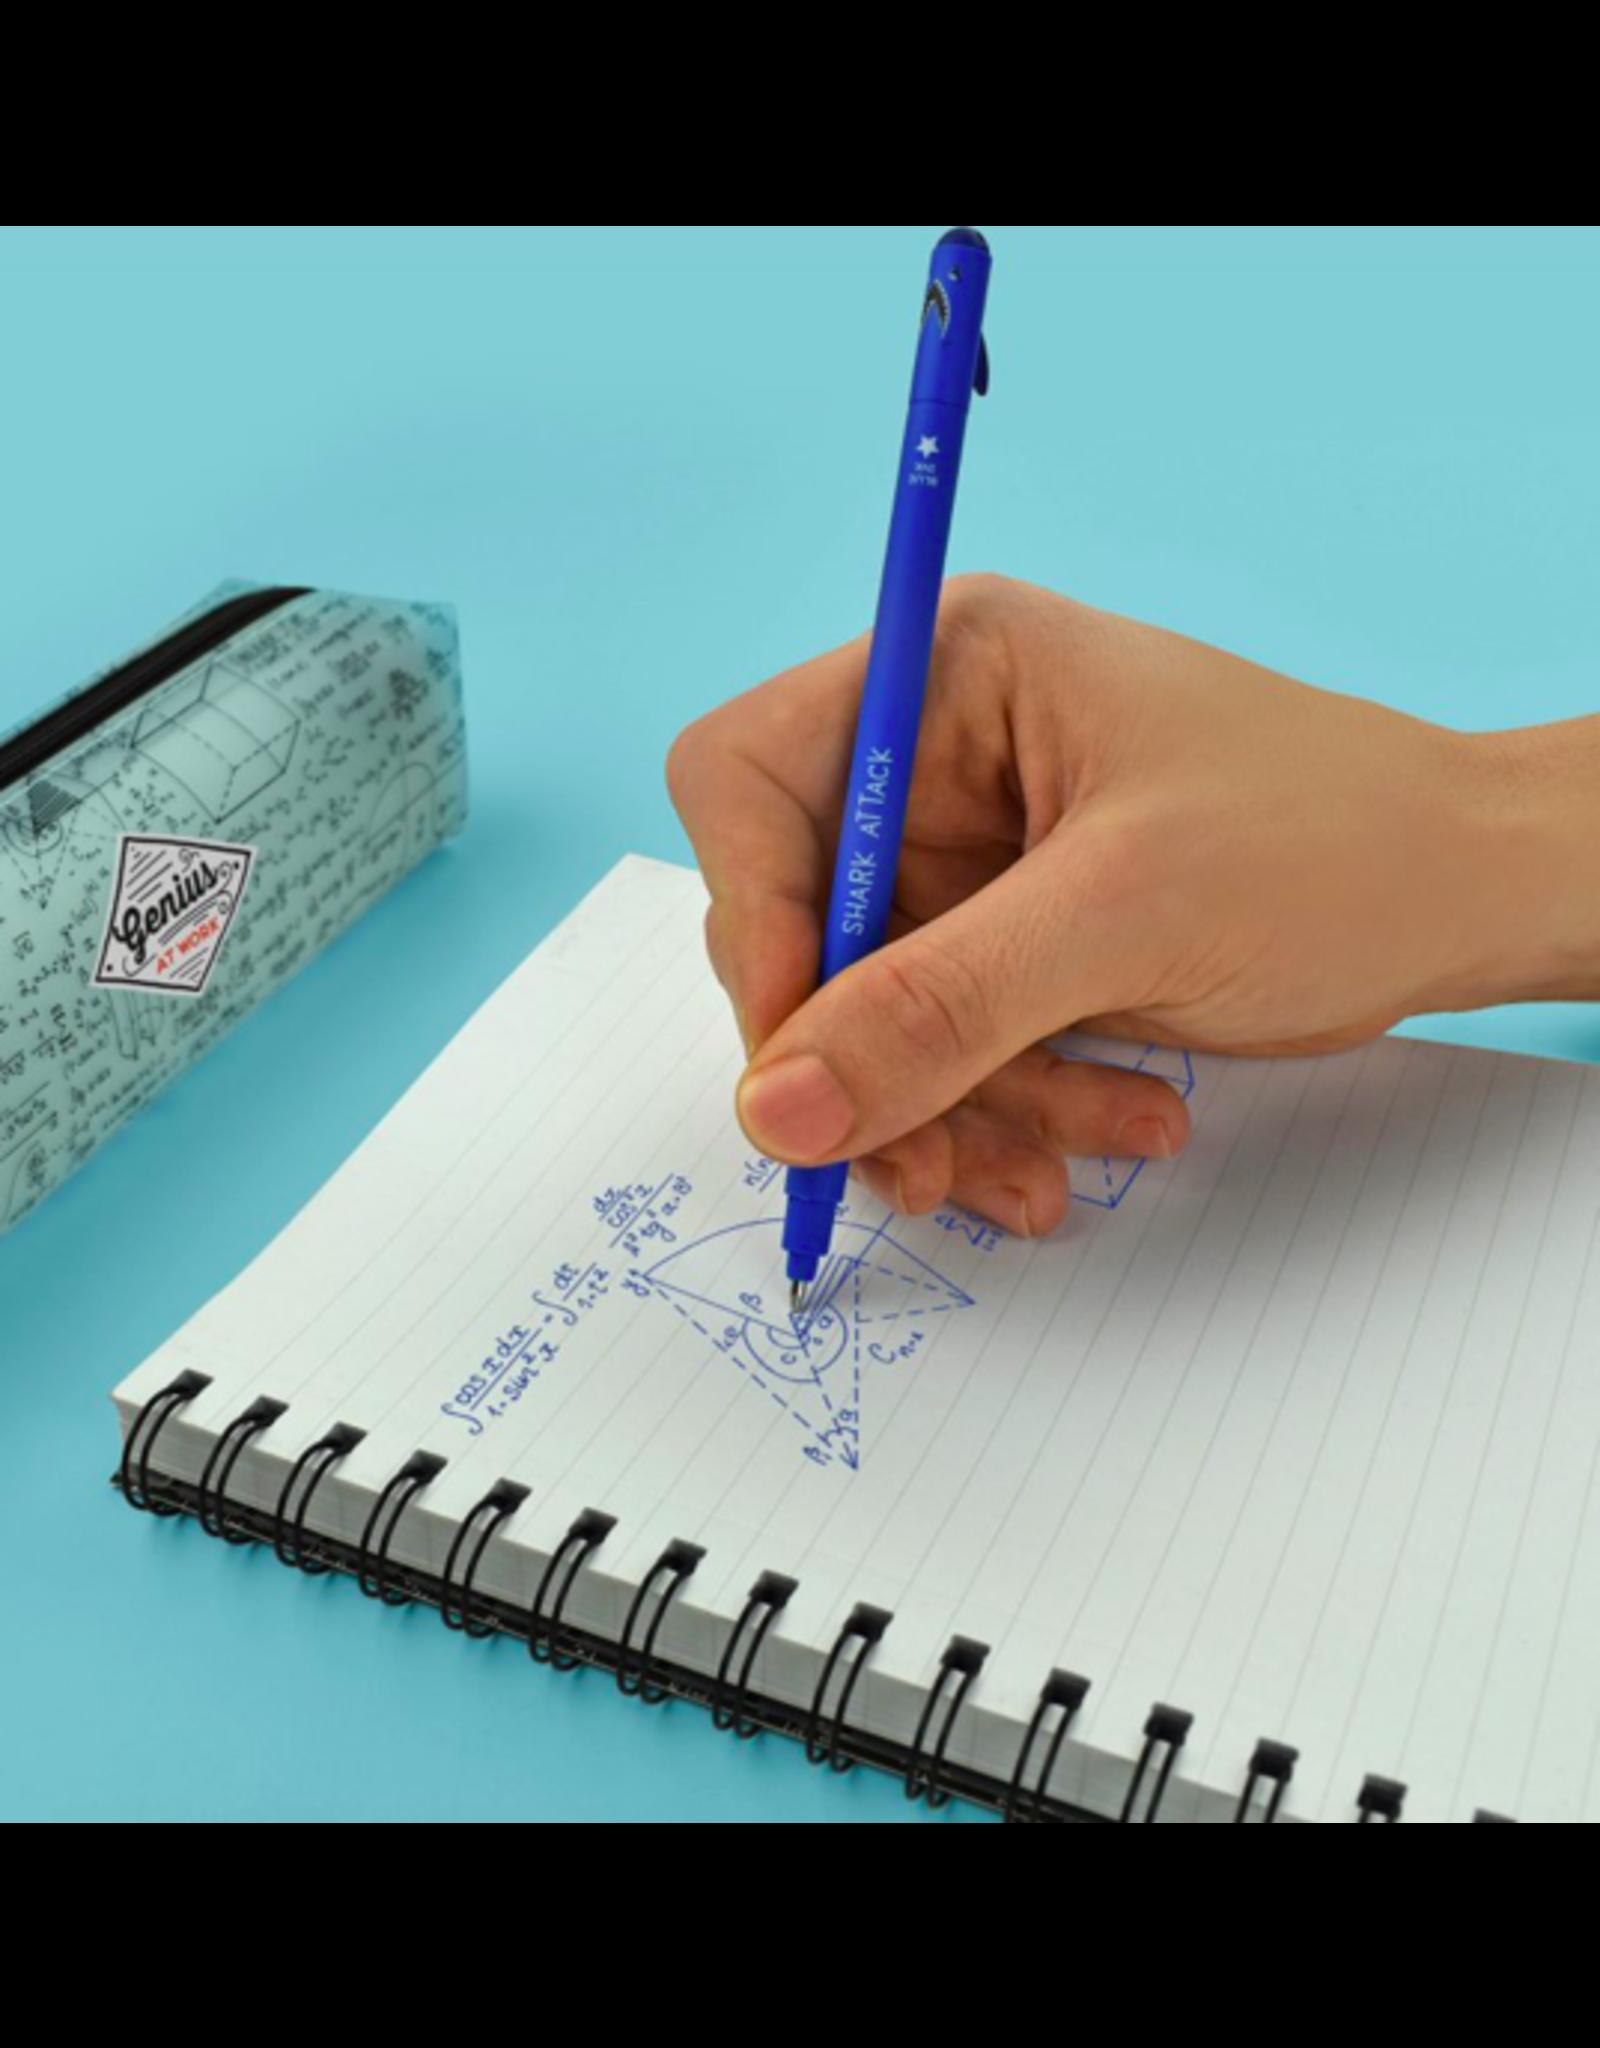 Legami erasable pen - shark (blue ink)